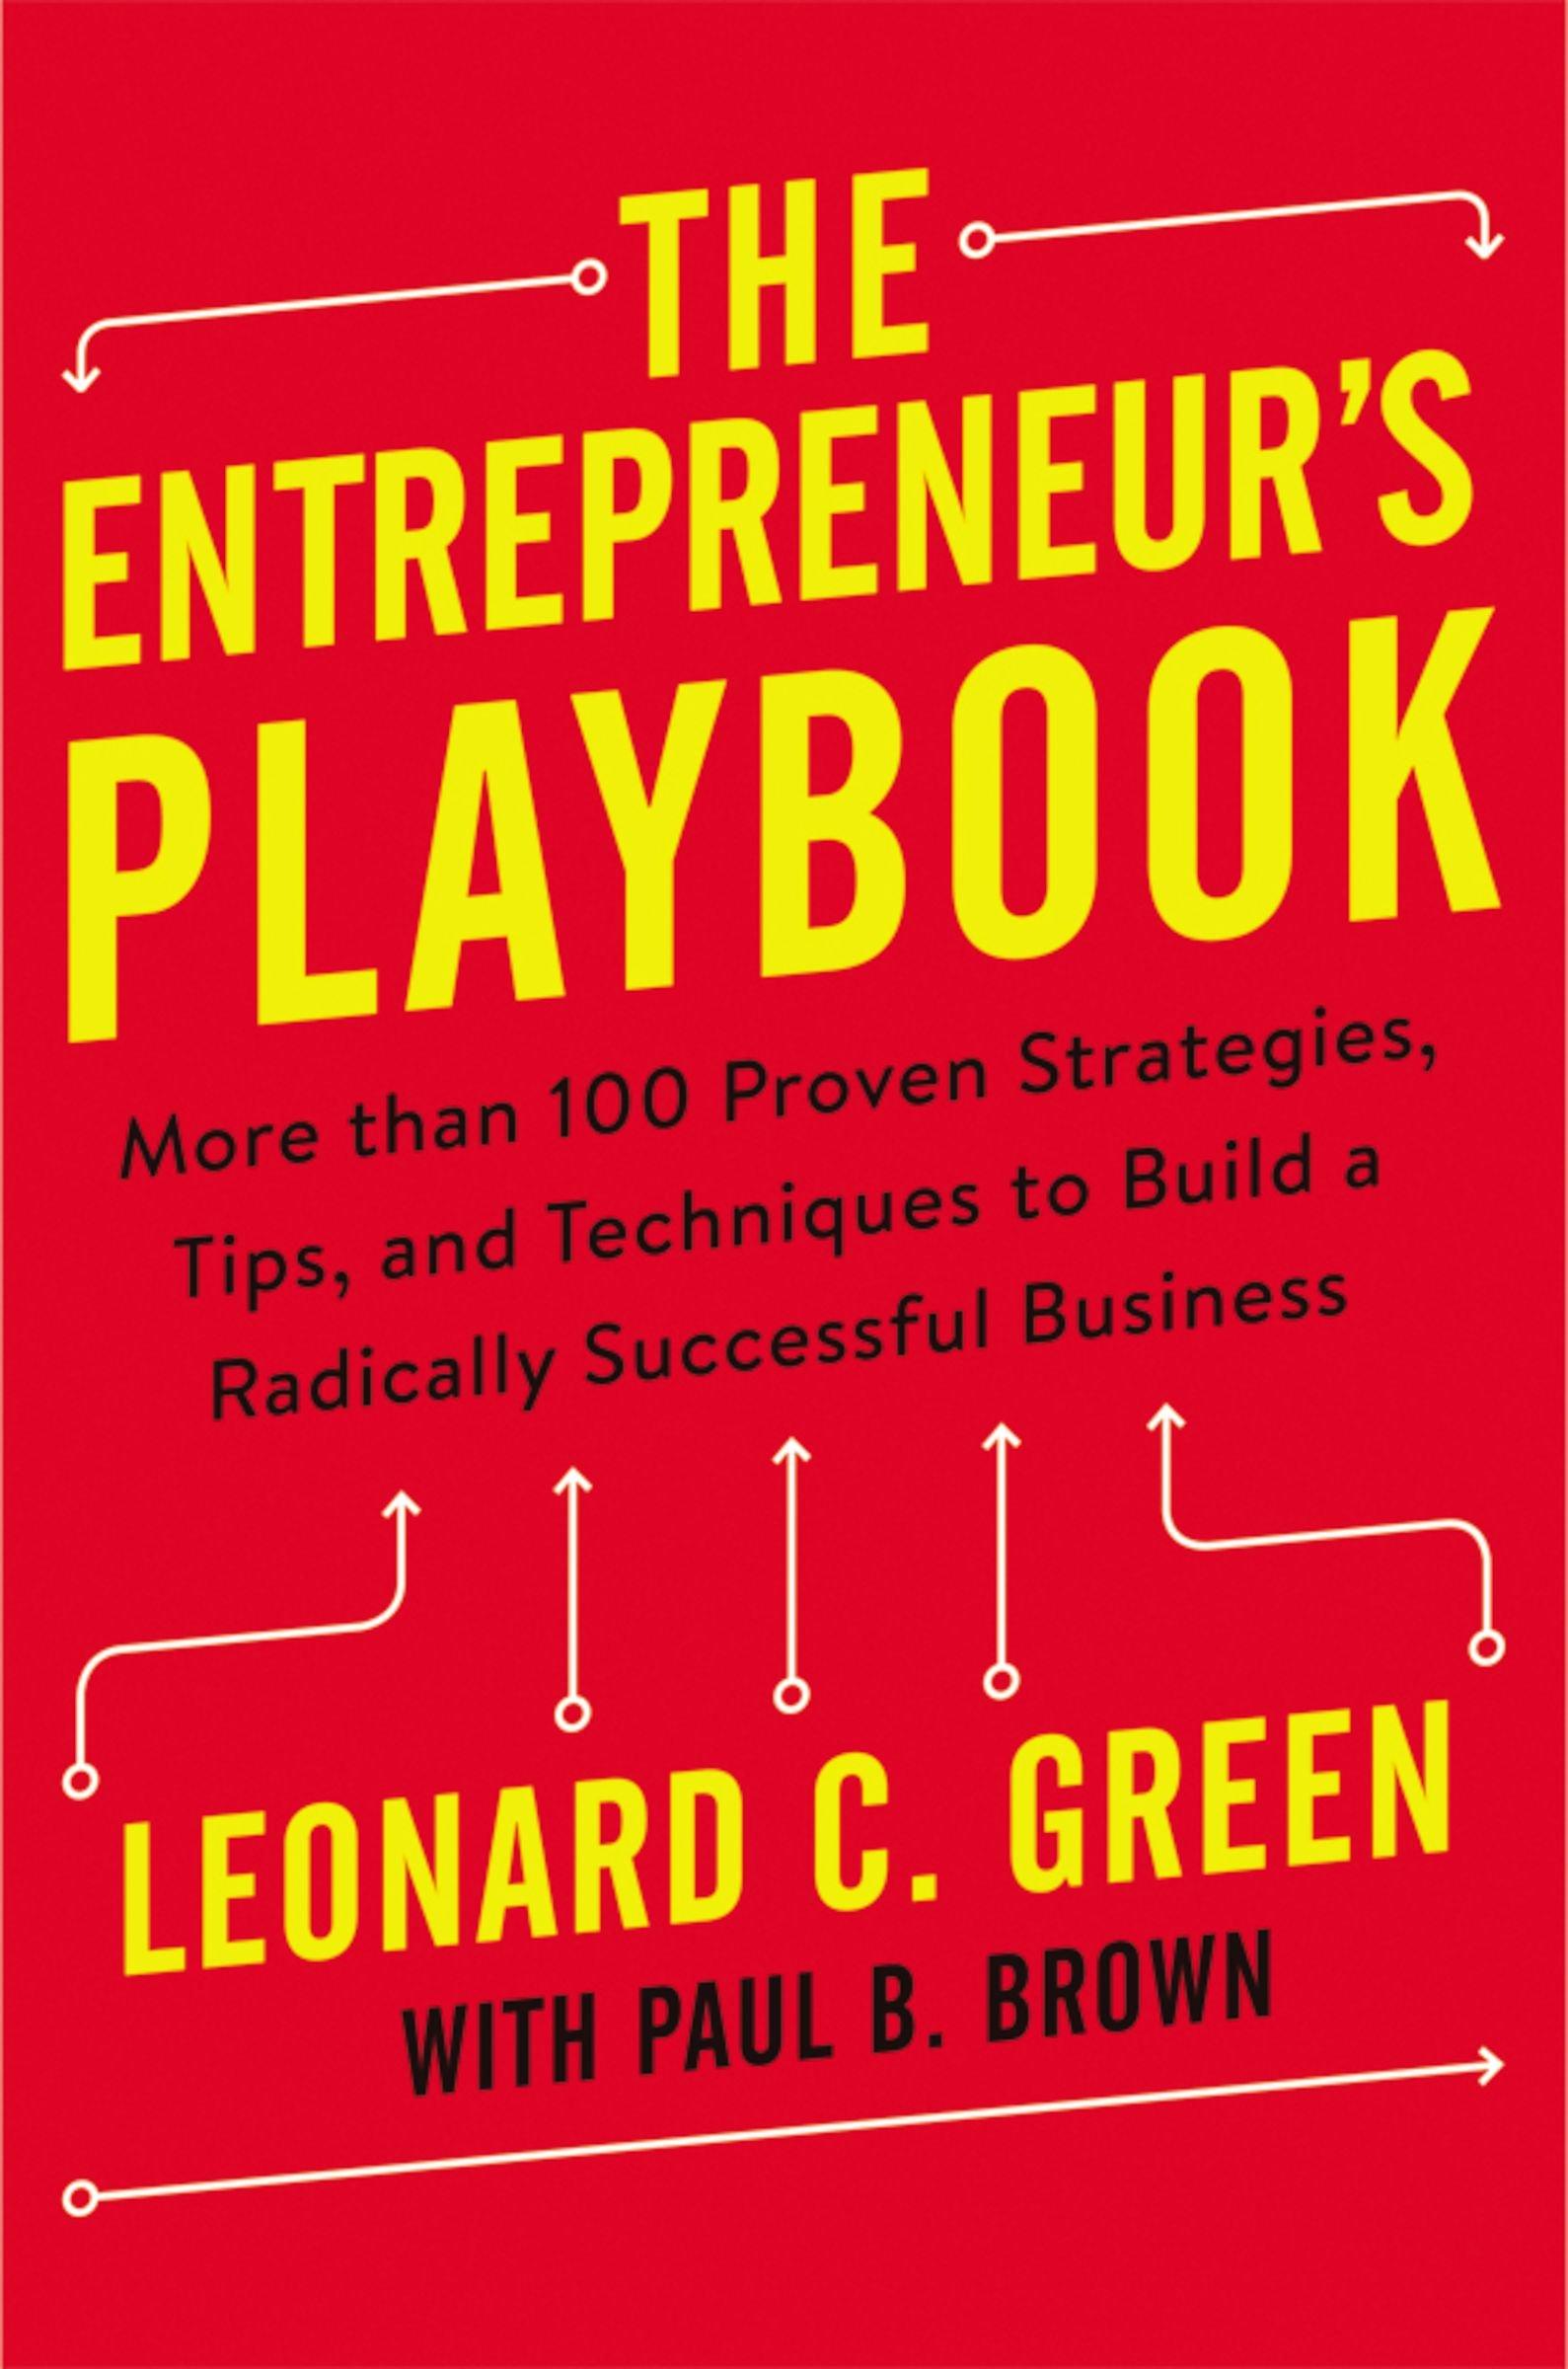 7c6d77b17b3d0 The Entrepreneur's Playbook: More than 100 Proven Strategies, Tips ...